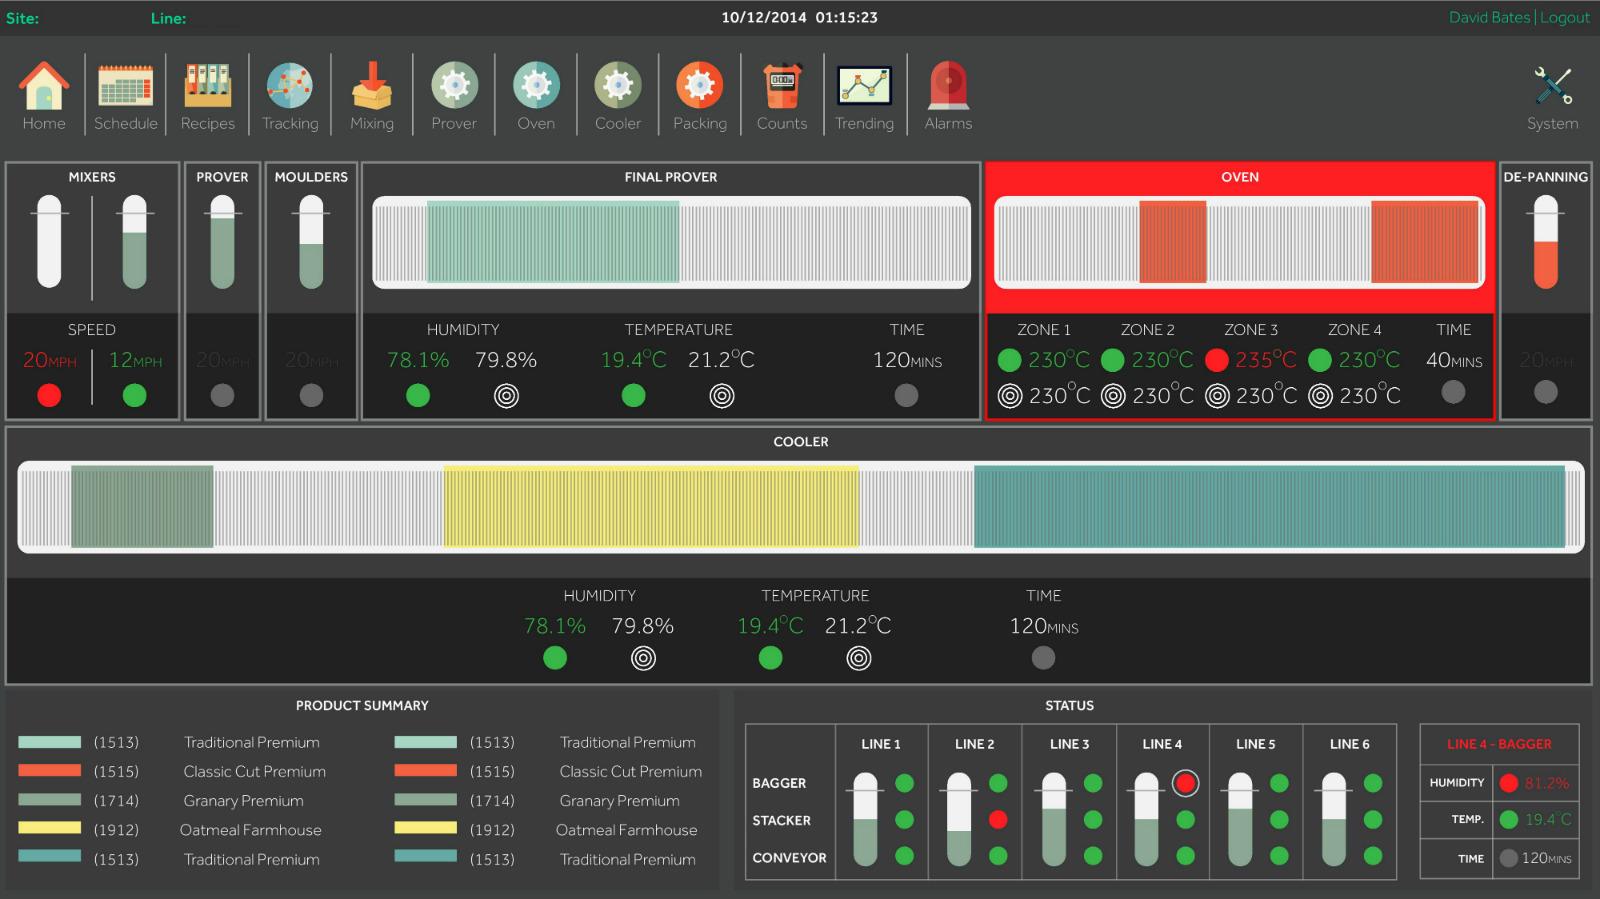 OAL Big Data Bakery SCADA Screen